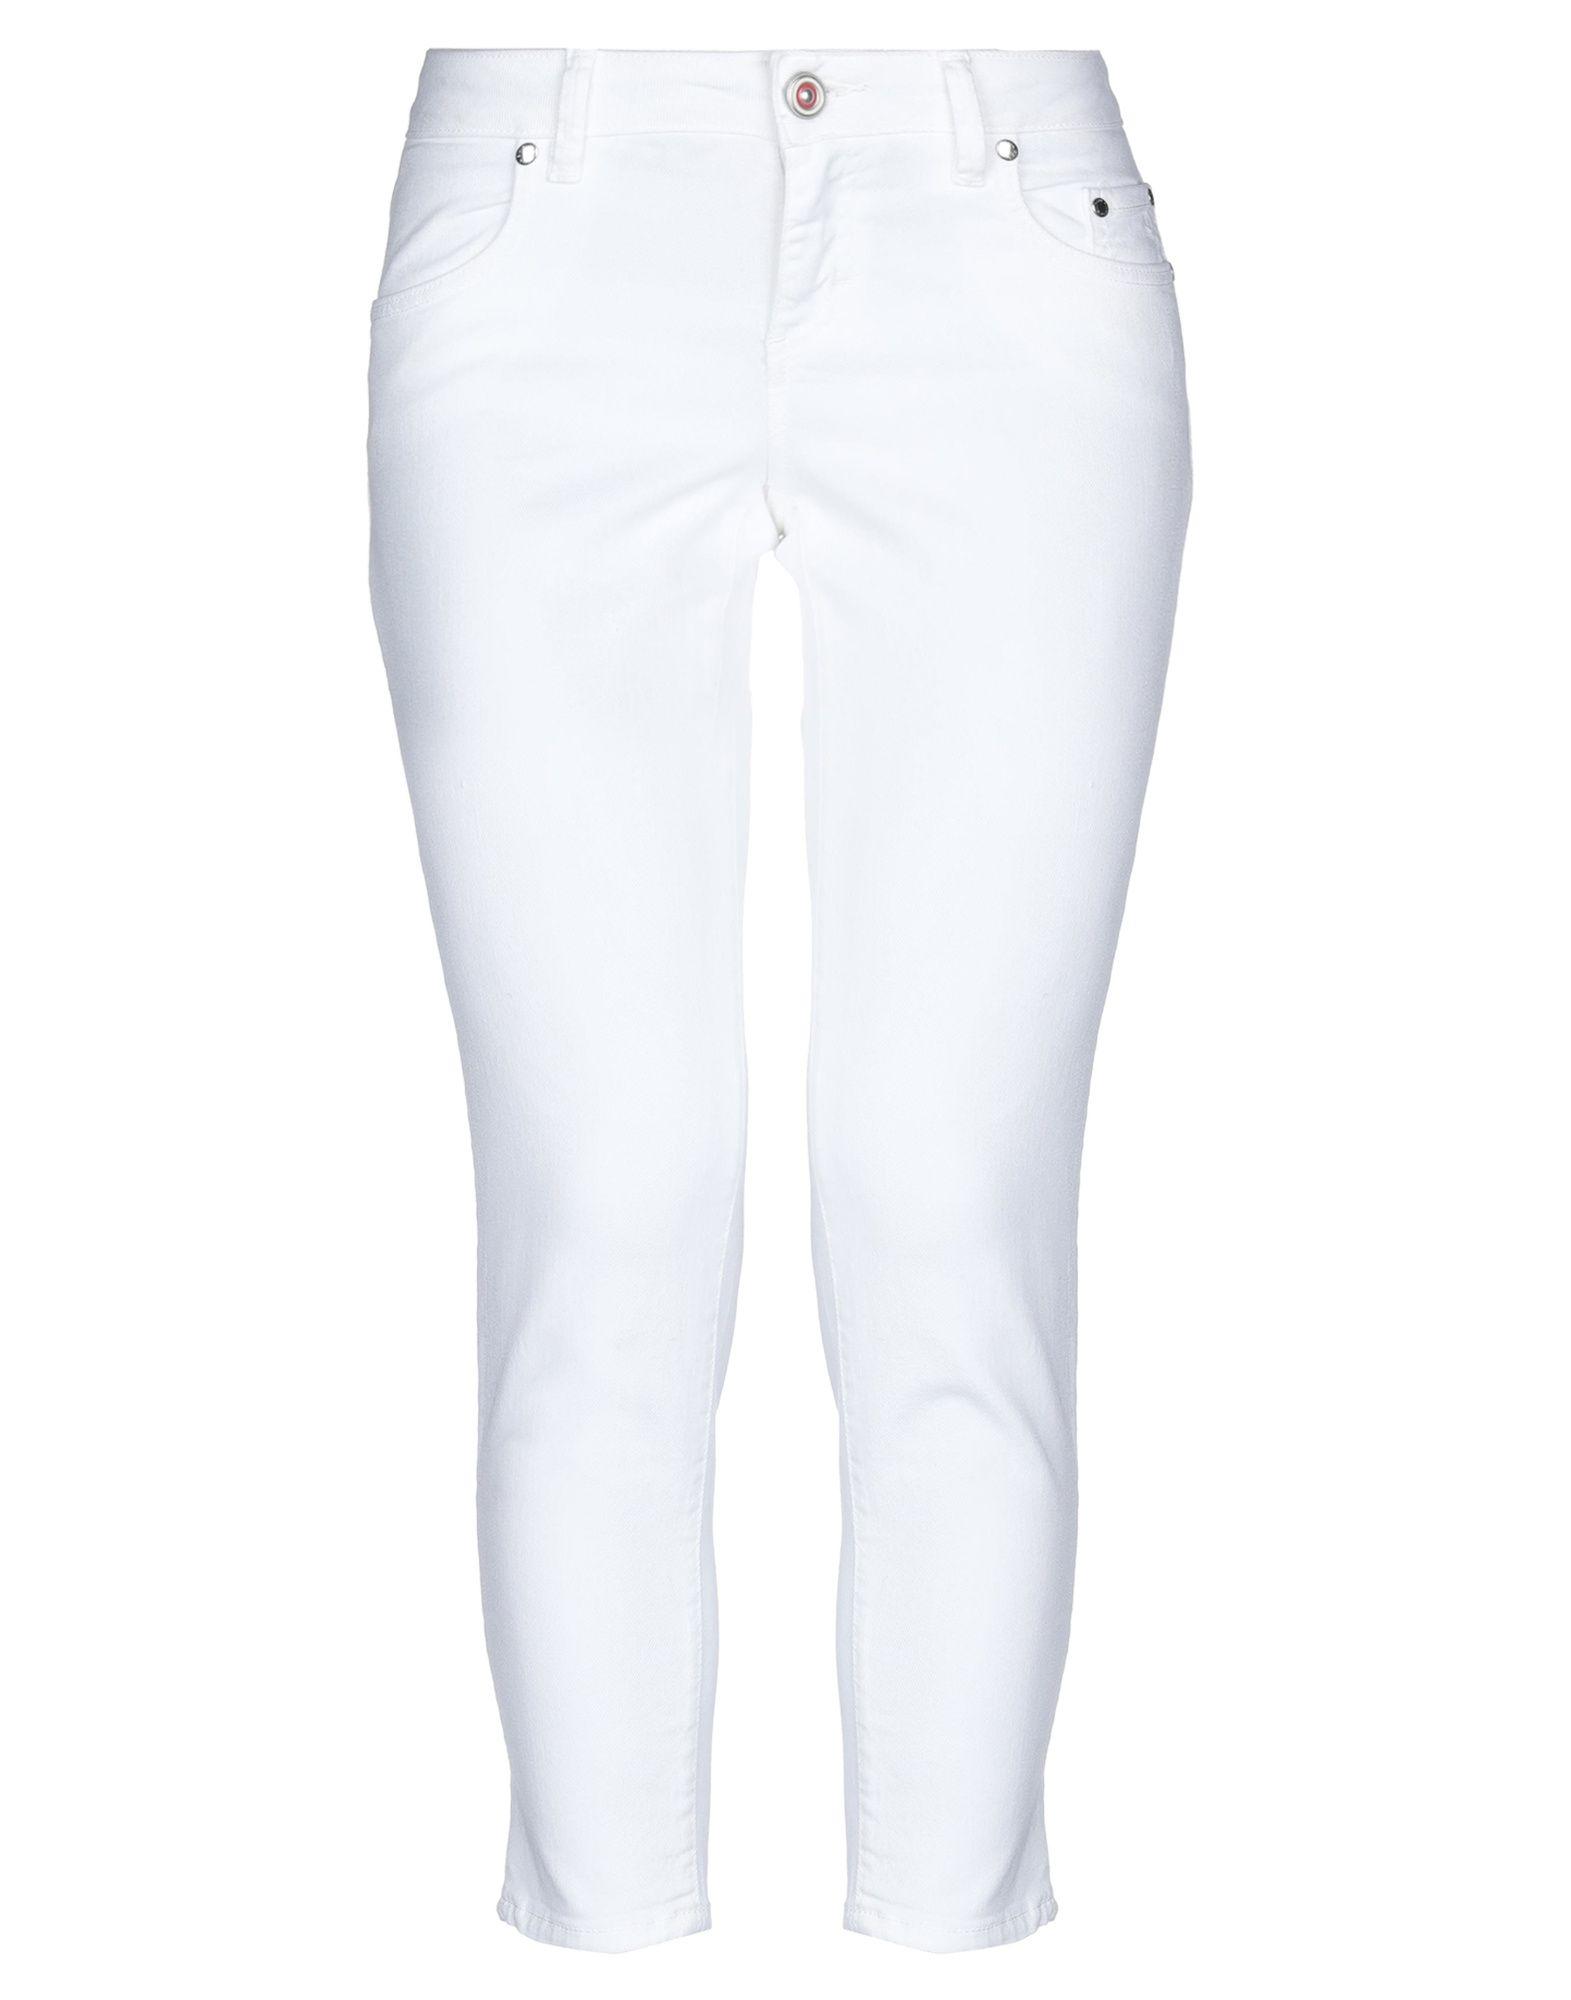 SIVIGLIA Джинсовые брюки-капри джинсовые капри женские купить